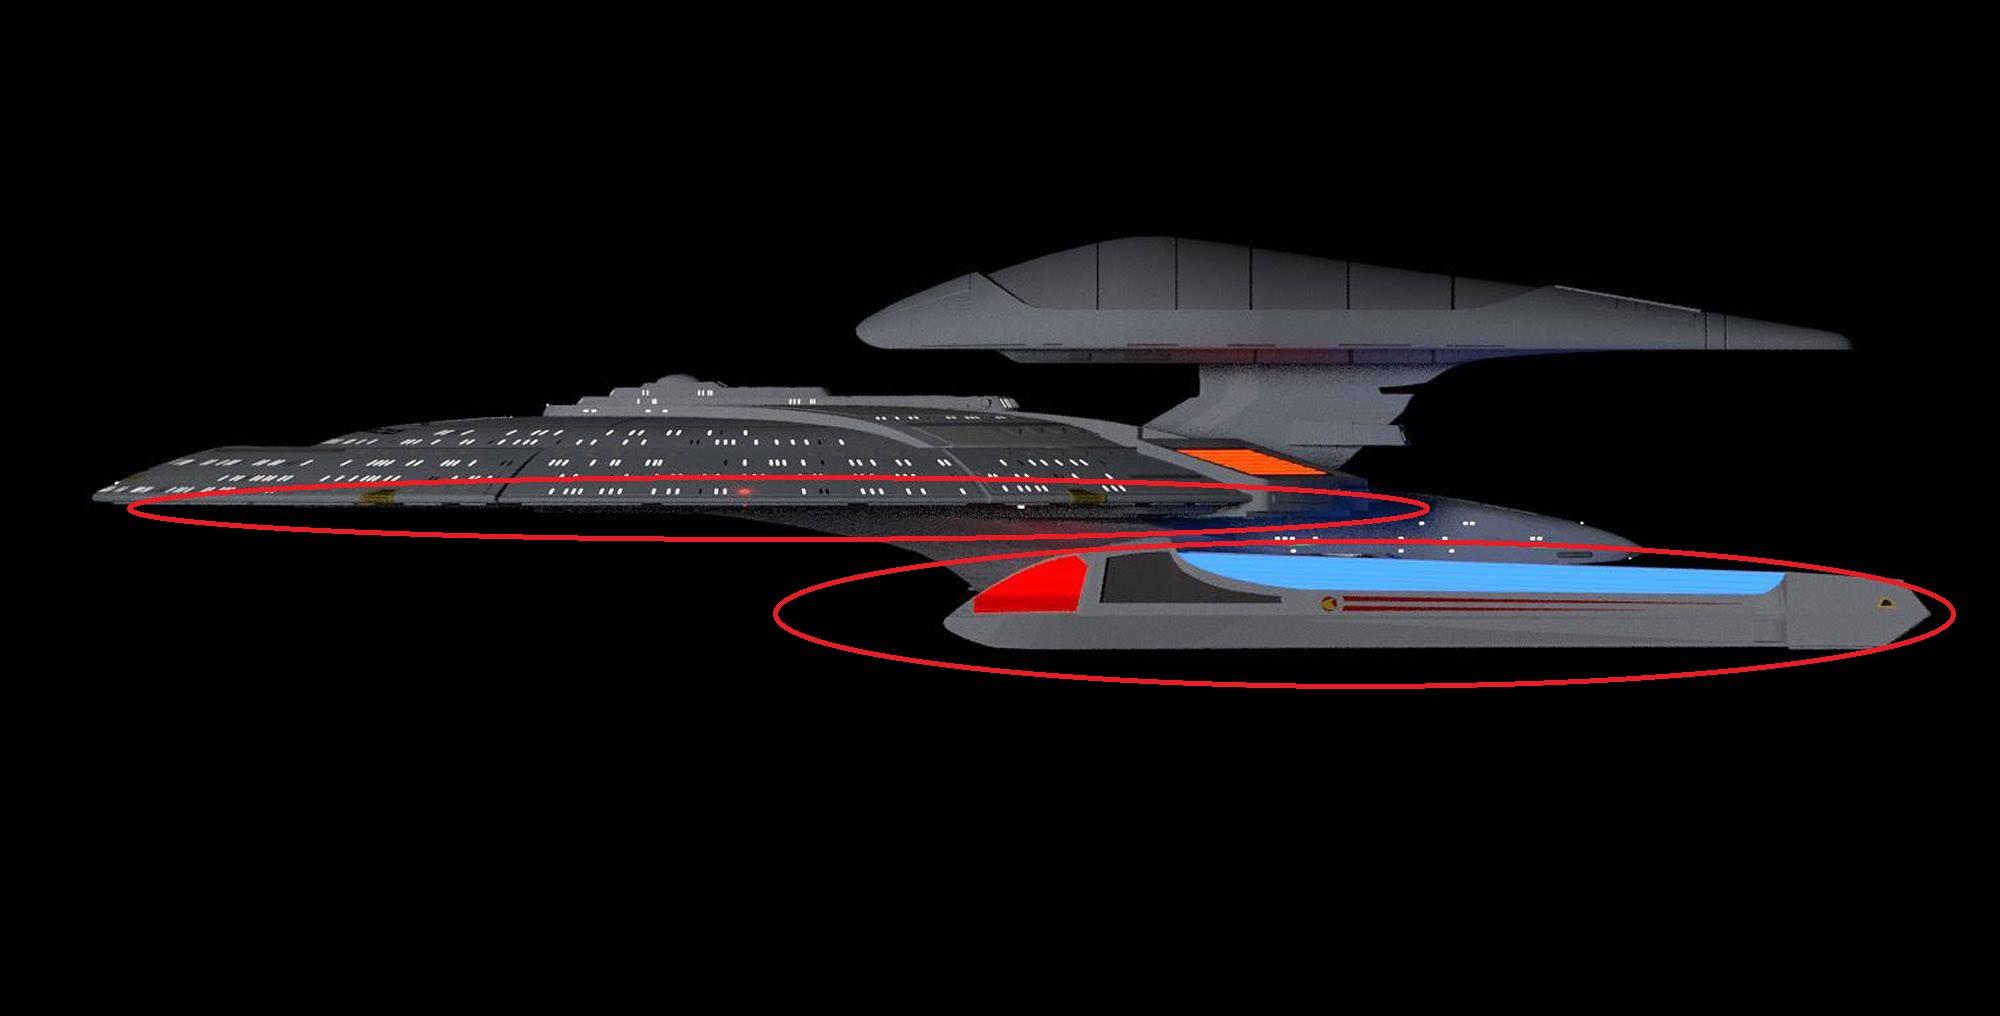 Primary_Ship_Damage_Port_View.jpg